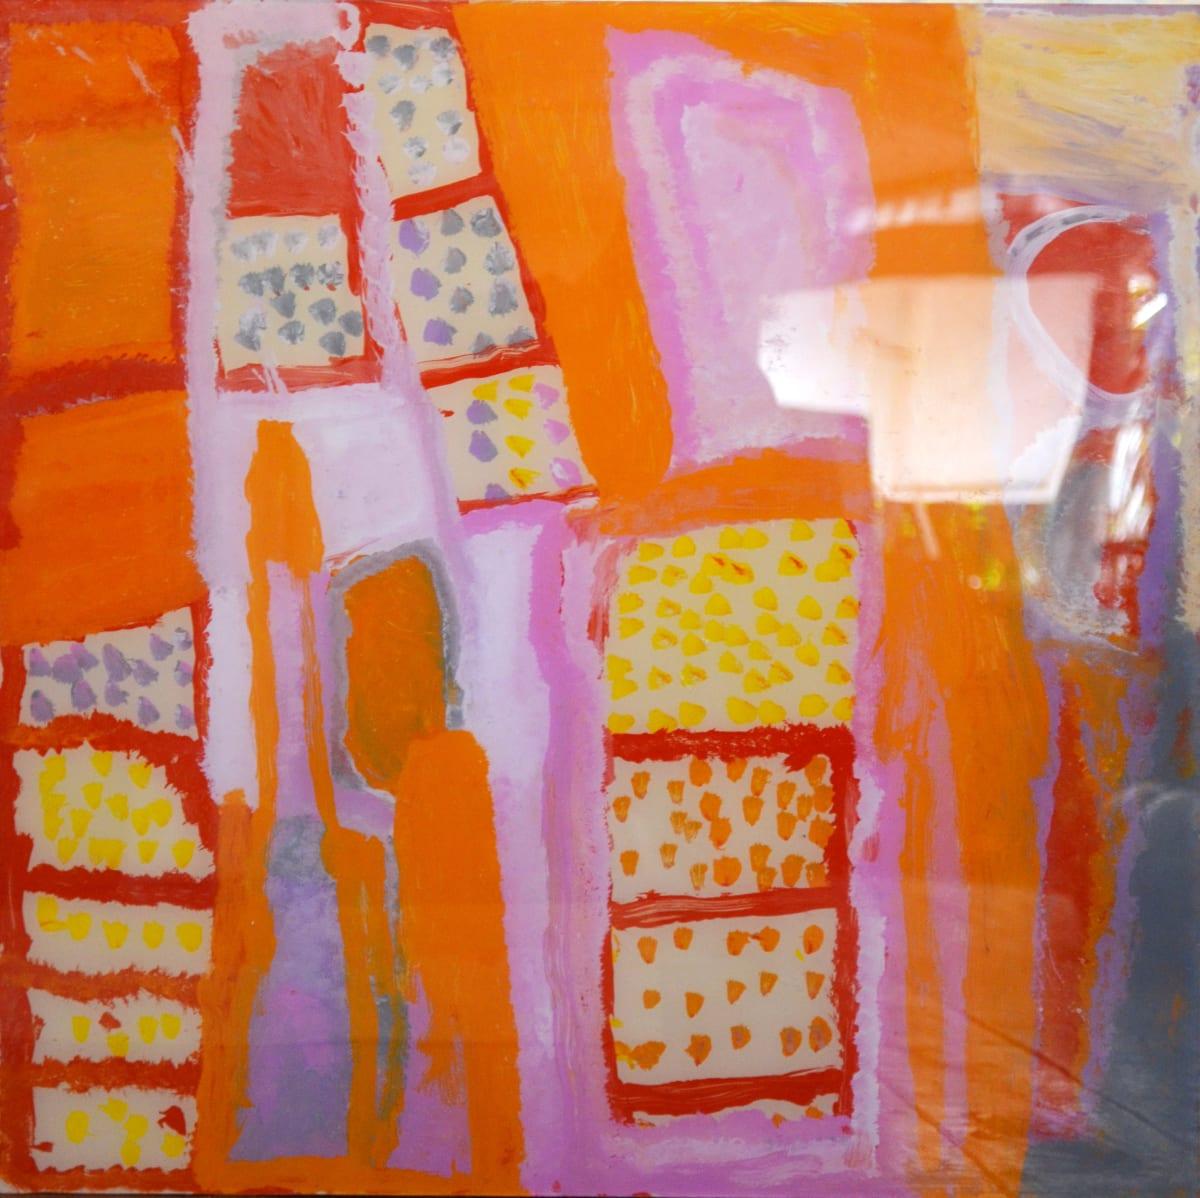 Daisy Japulija Billabongs acrylic on polycarbonate 60 x 60 cm